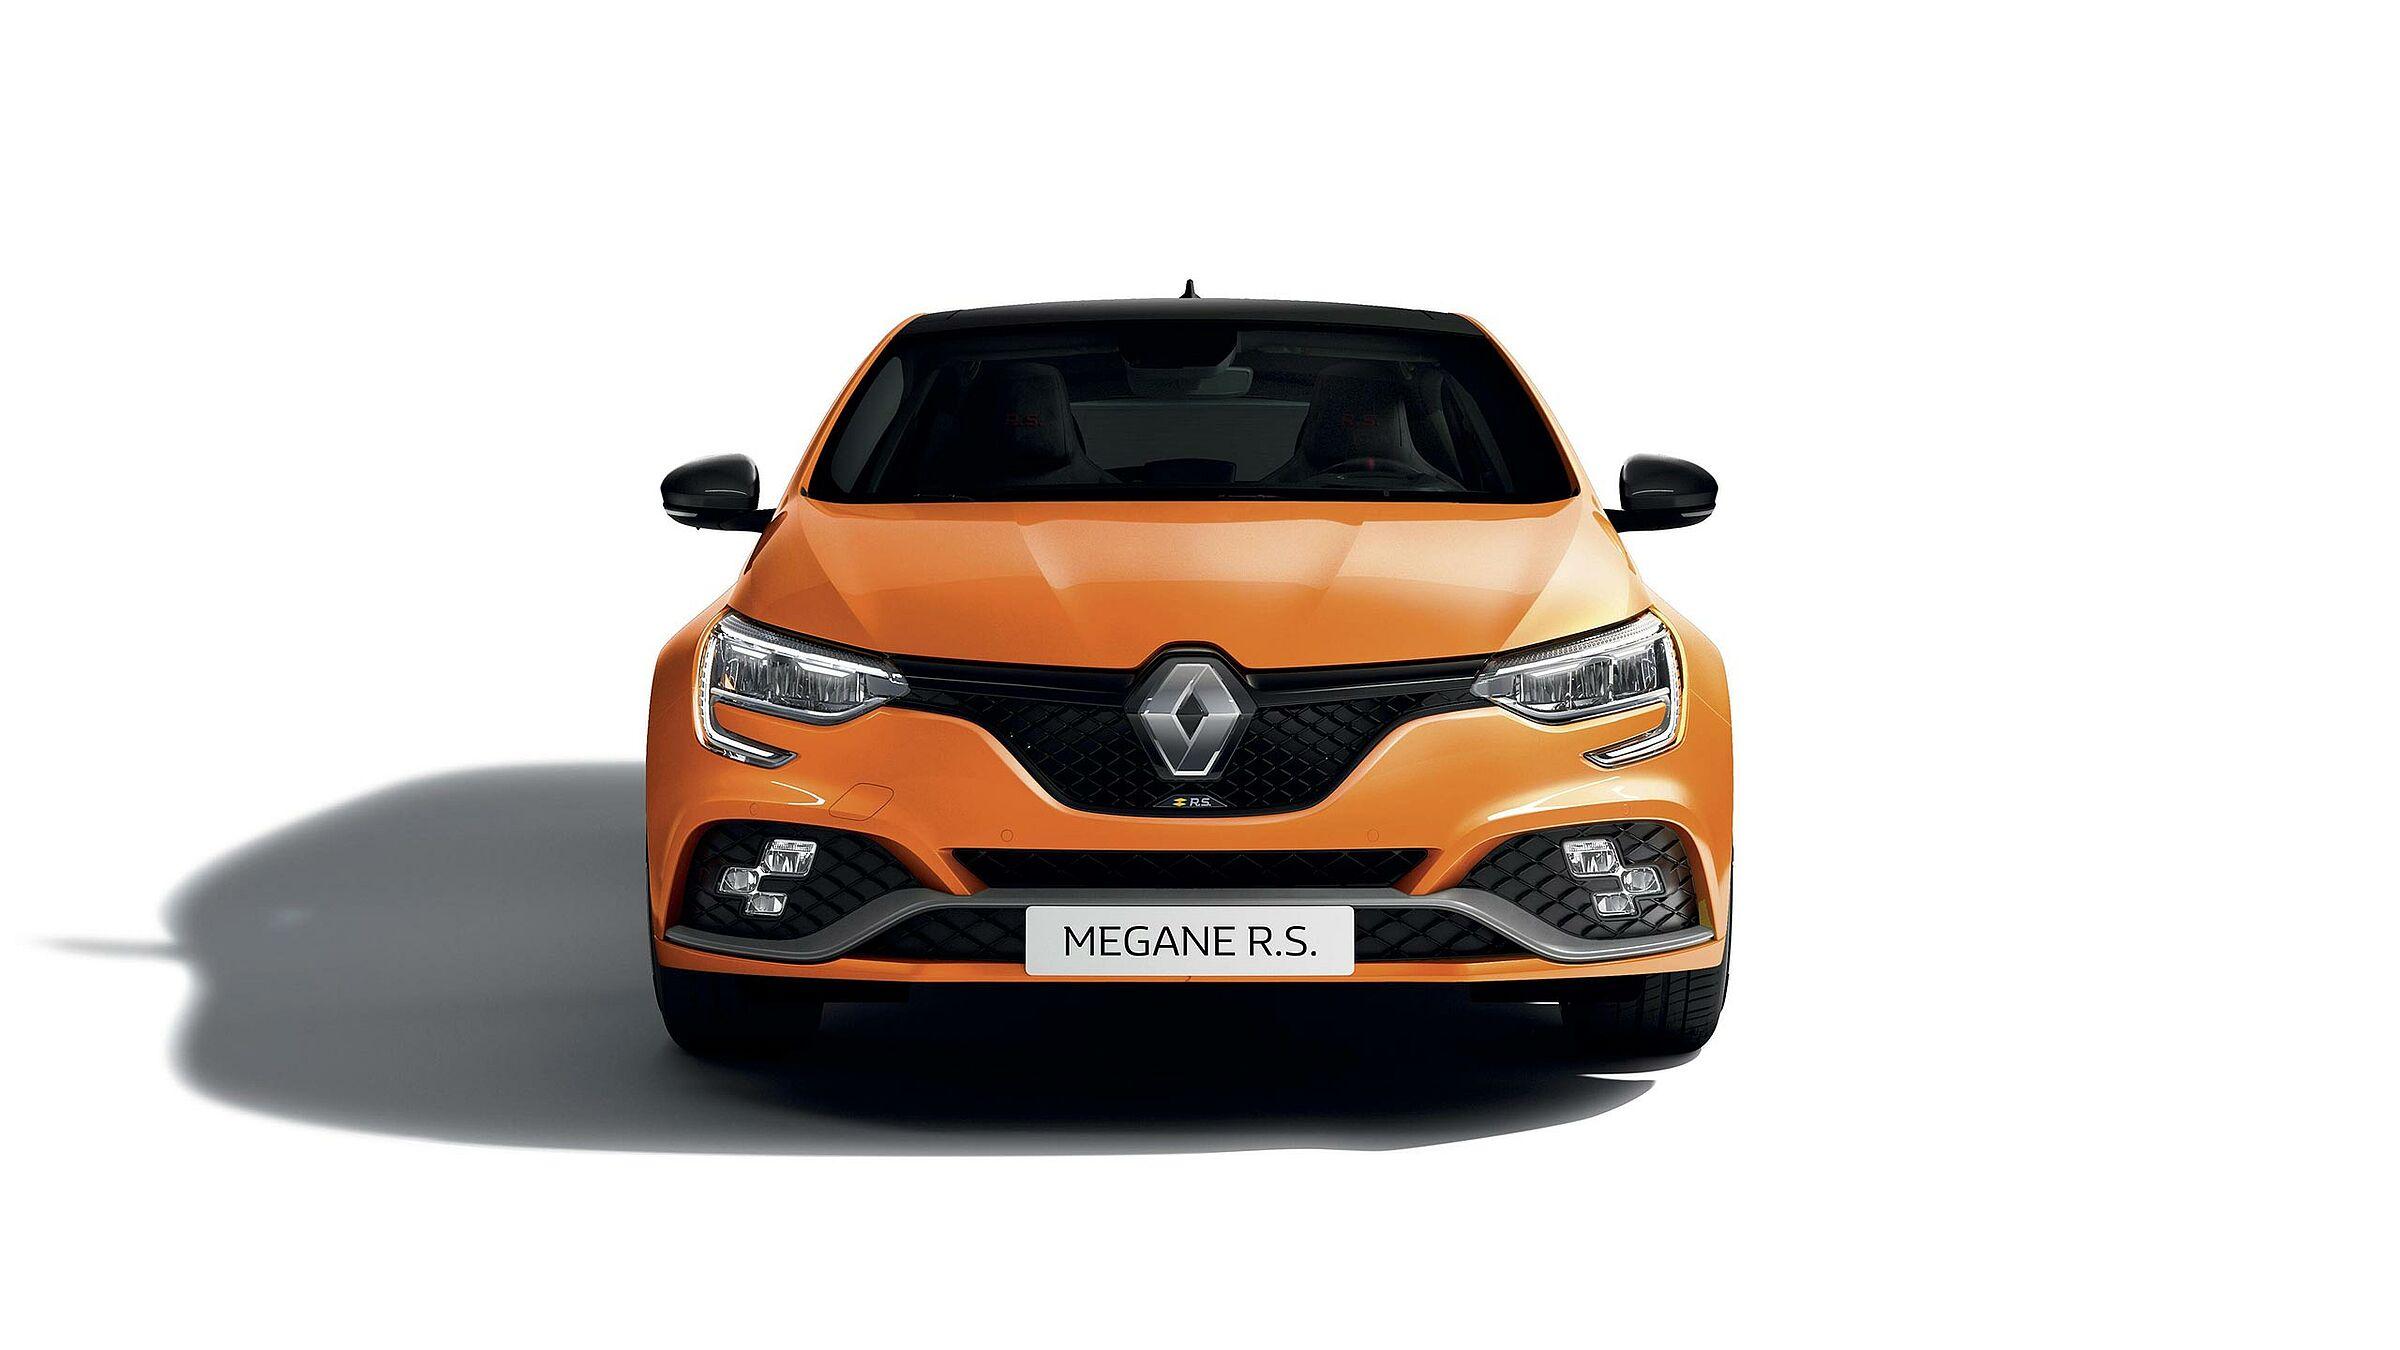 Renault Megane R.S. Autozentren P&A-Preckel